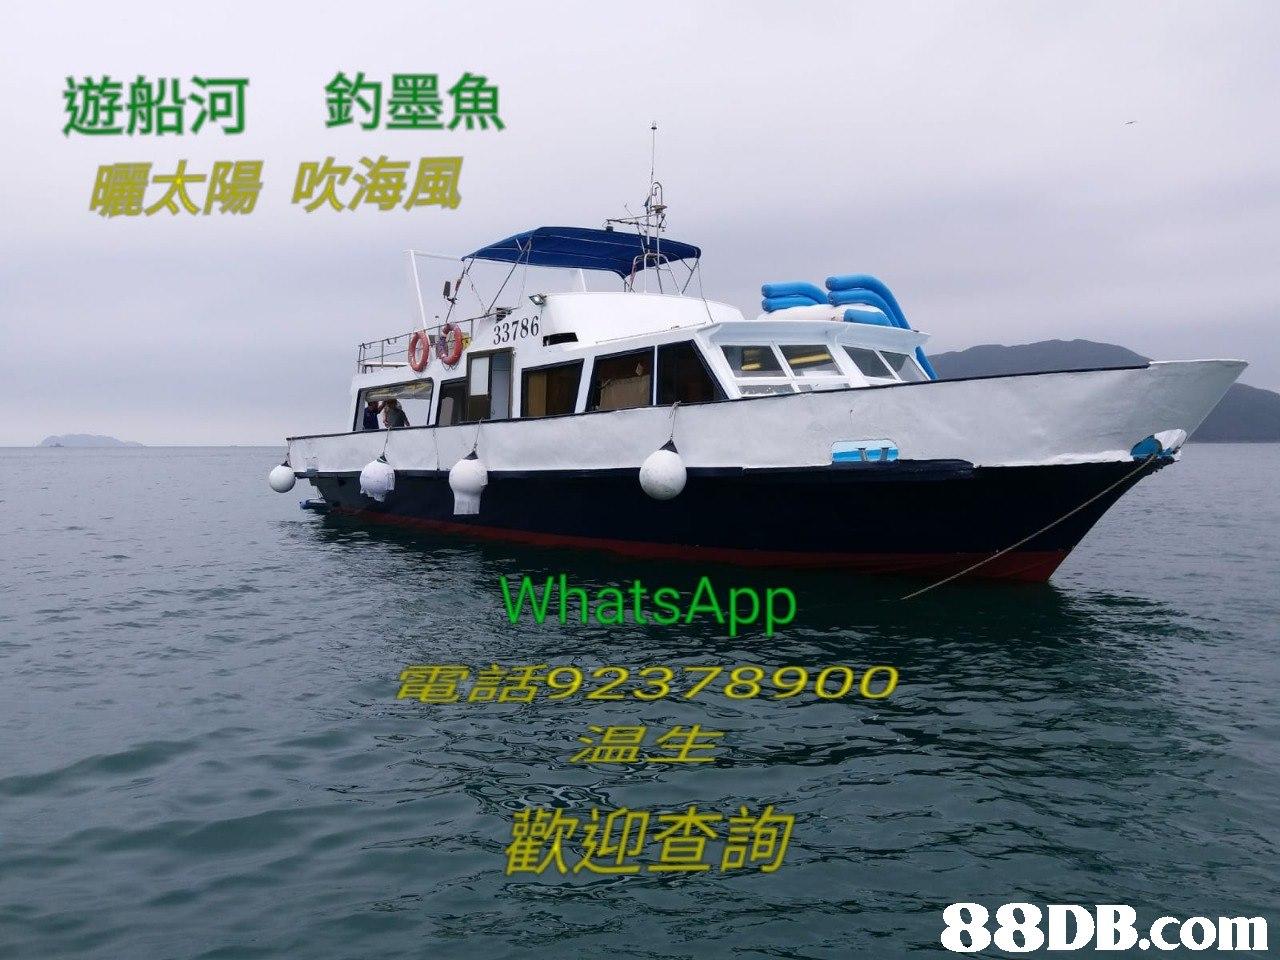 遊船河 釣墨魚 曬太陽吹海風 33786 WhatsApp 電言舌9 2 3 7 8 9 00 温生 歡迎 查詢   Vehicle,Water transportation,Boat,Yacht,Speedboat